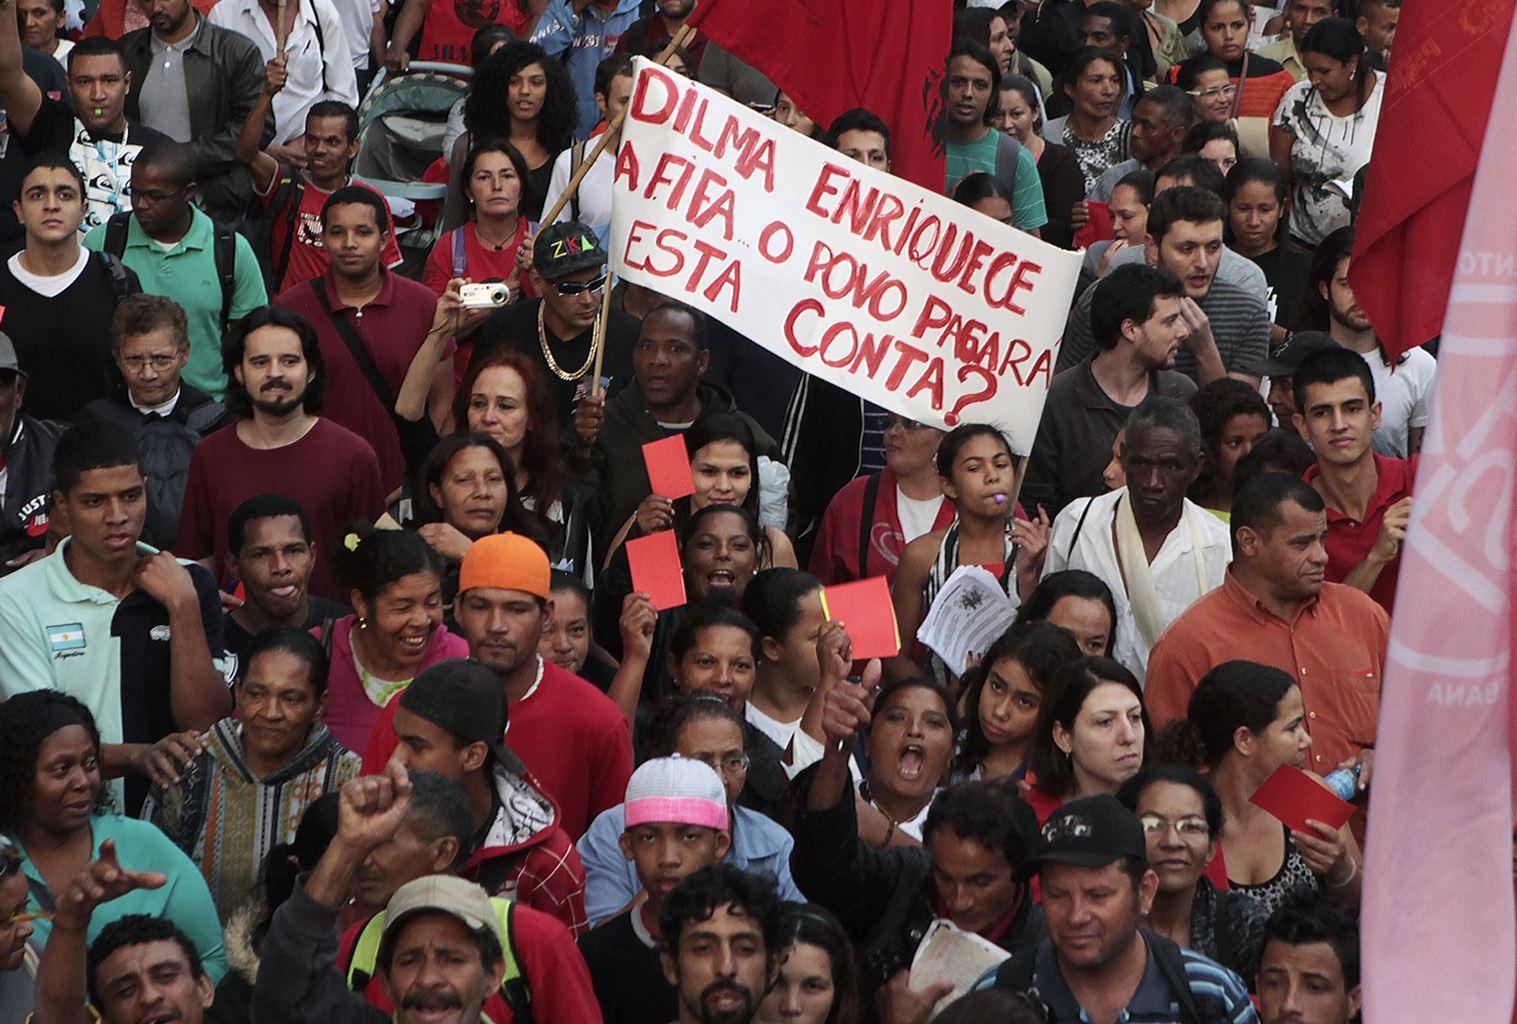 2013-06-14T225214Z_1233842448_GM1E96F0IYH01_RTRMADP_3_BRAZIL-PROTESTS